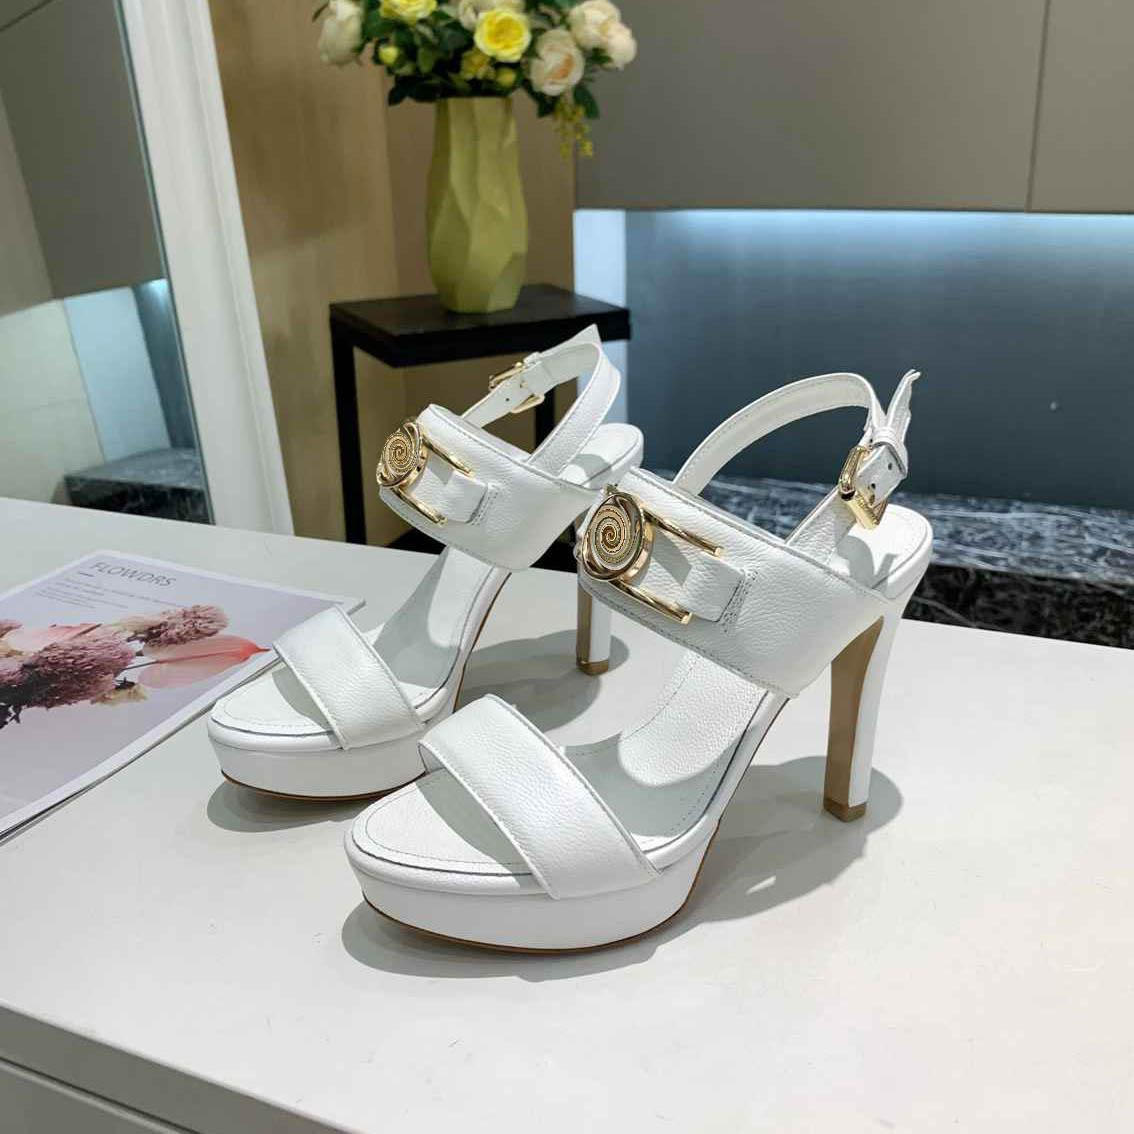 Diseñador de mujeres tacones altos 10,5 cm Sandalias Slippers Horsebit Slides Party Bombas de boda con caja